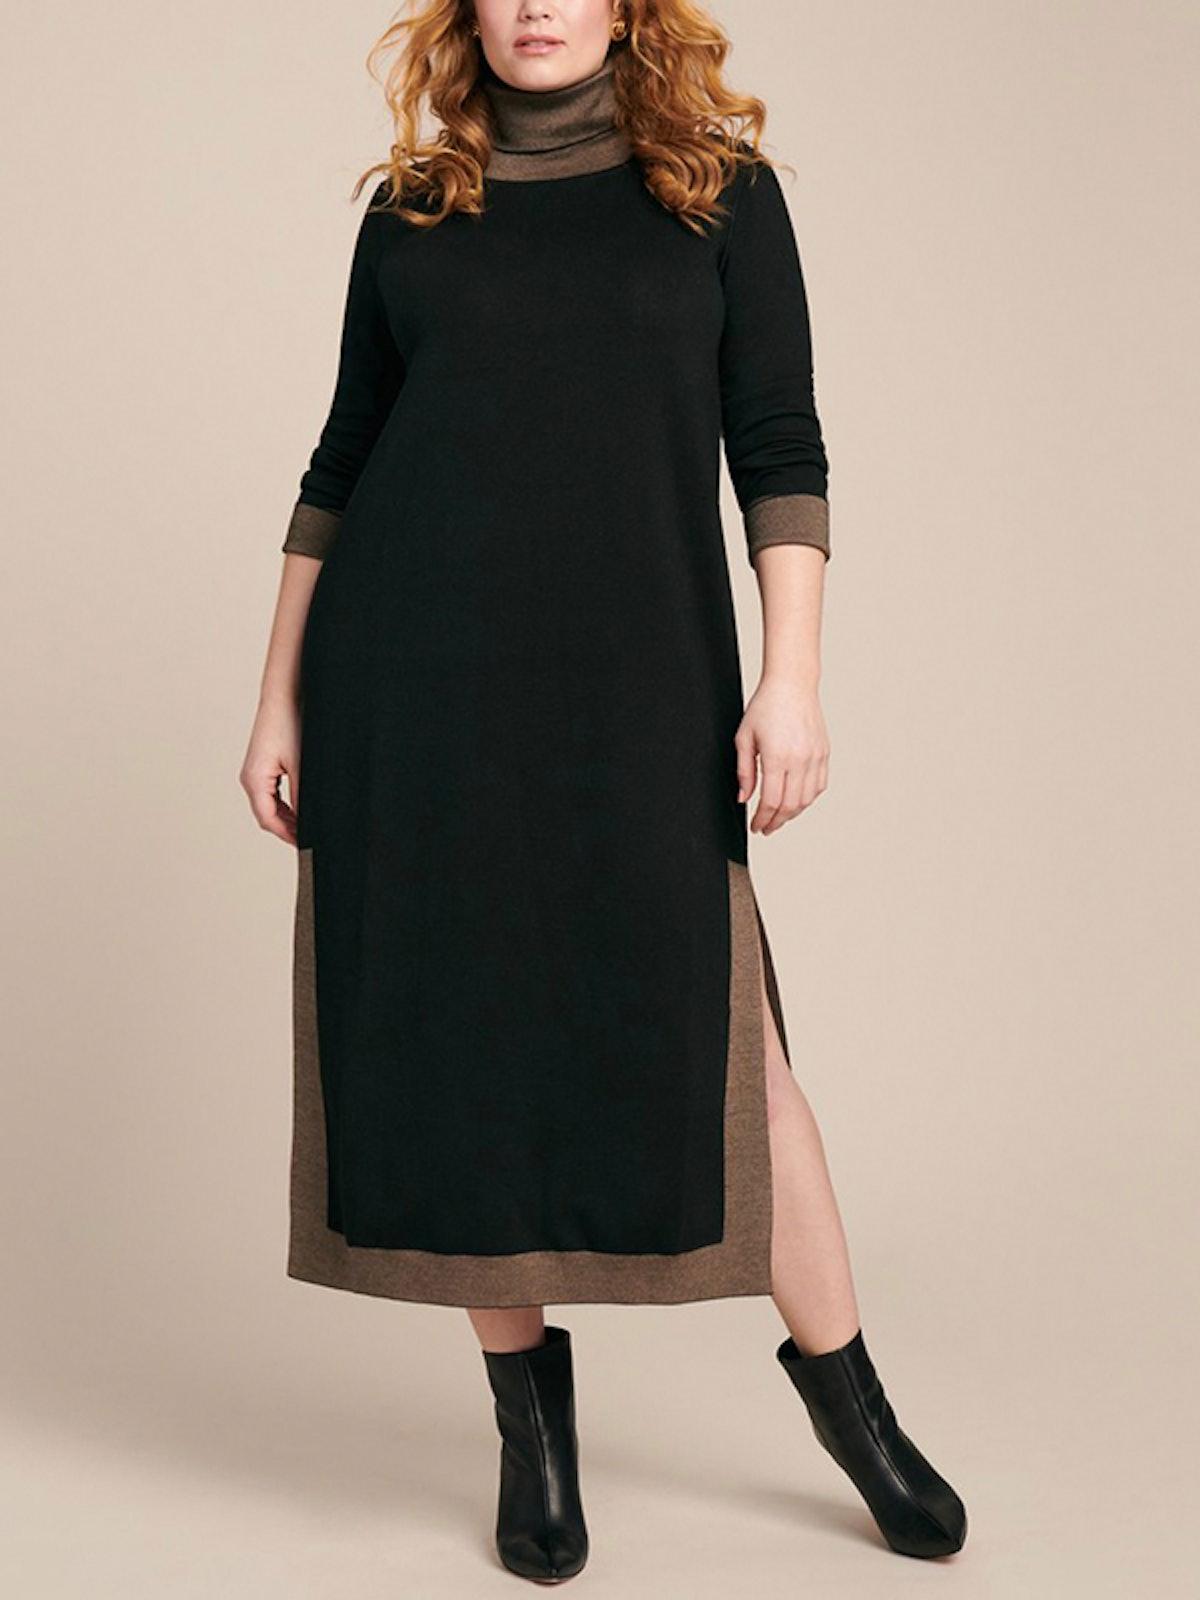 Travel Kit Dress